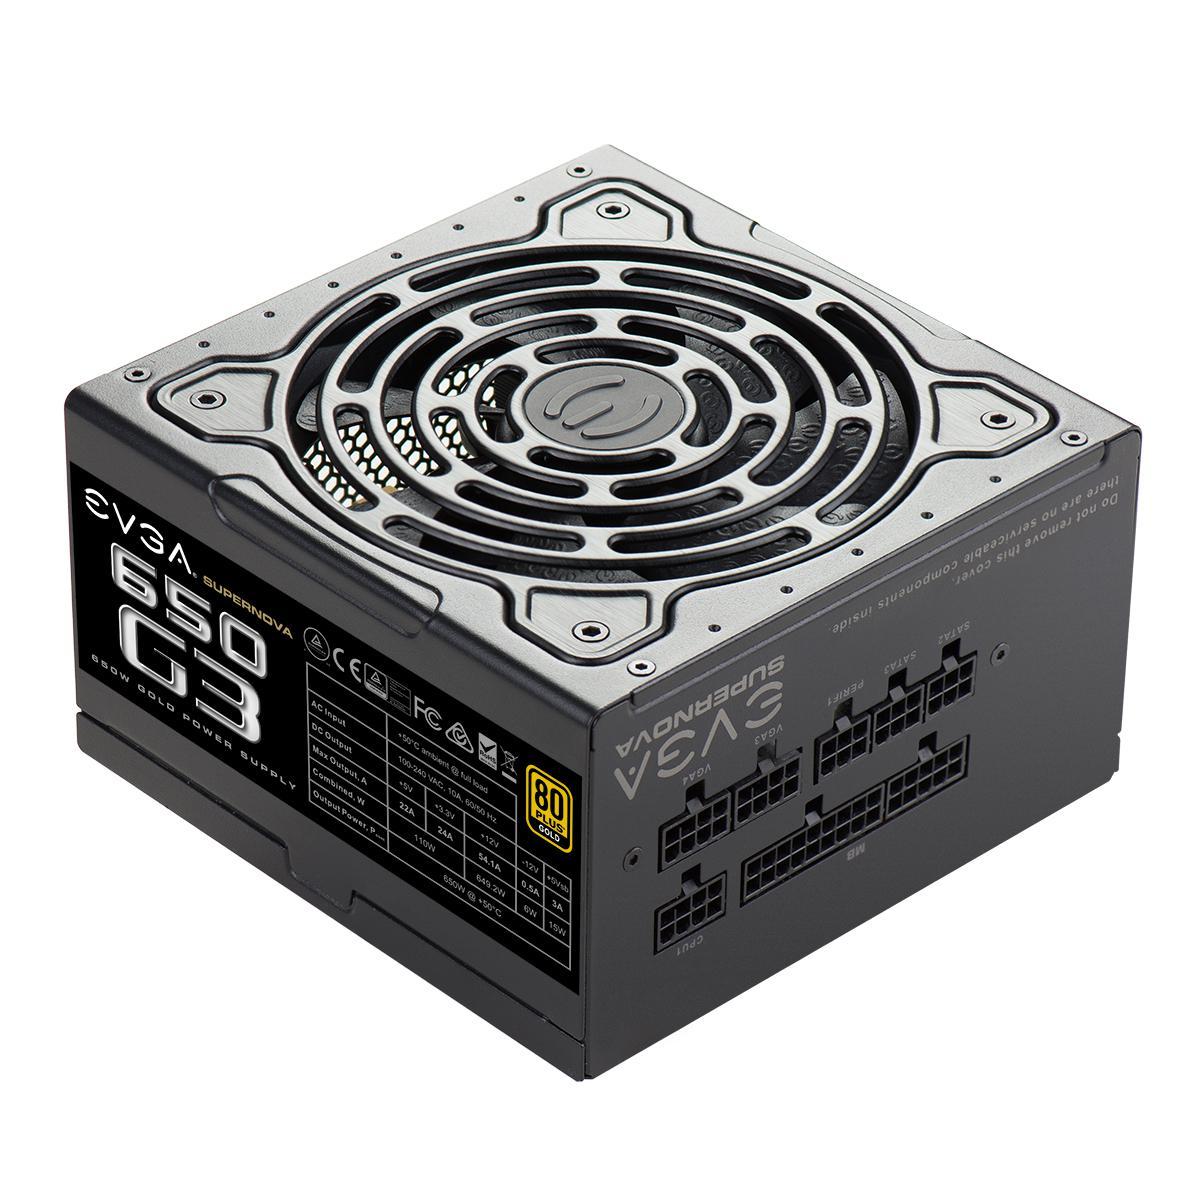 EVGA SuperNOVA G3 650 W 80+ Gold Certified Fully Modular ATX Power Supply